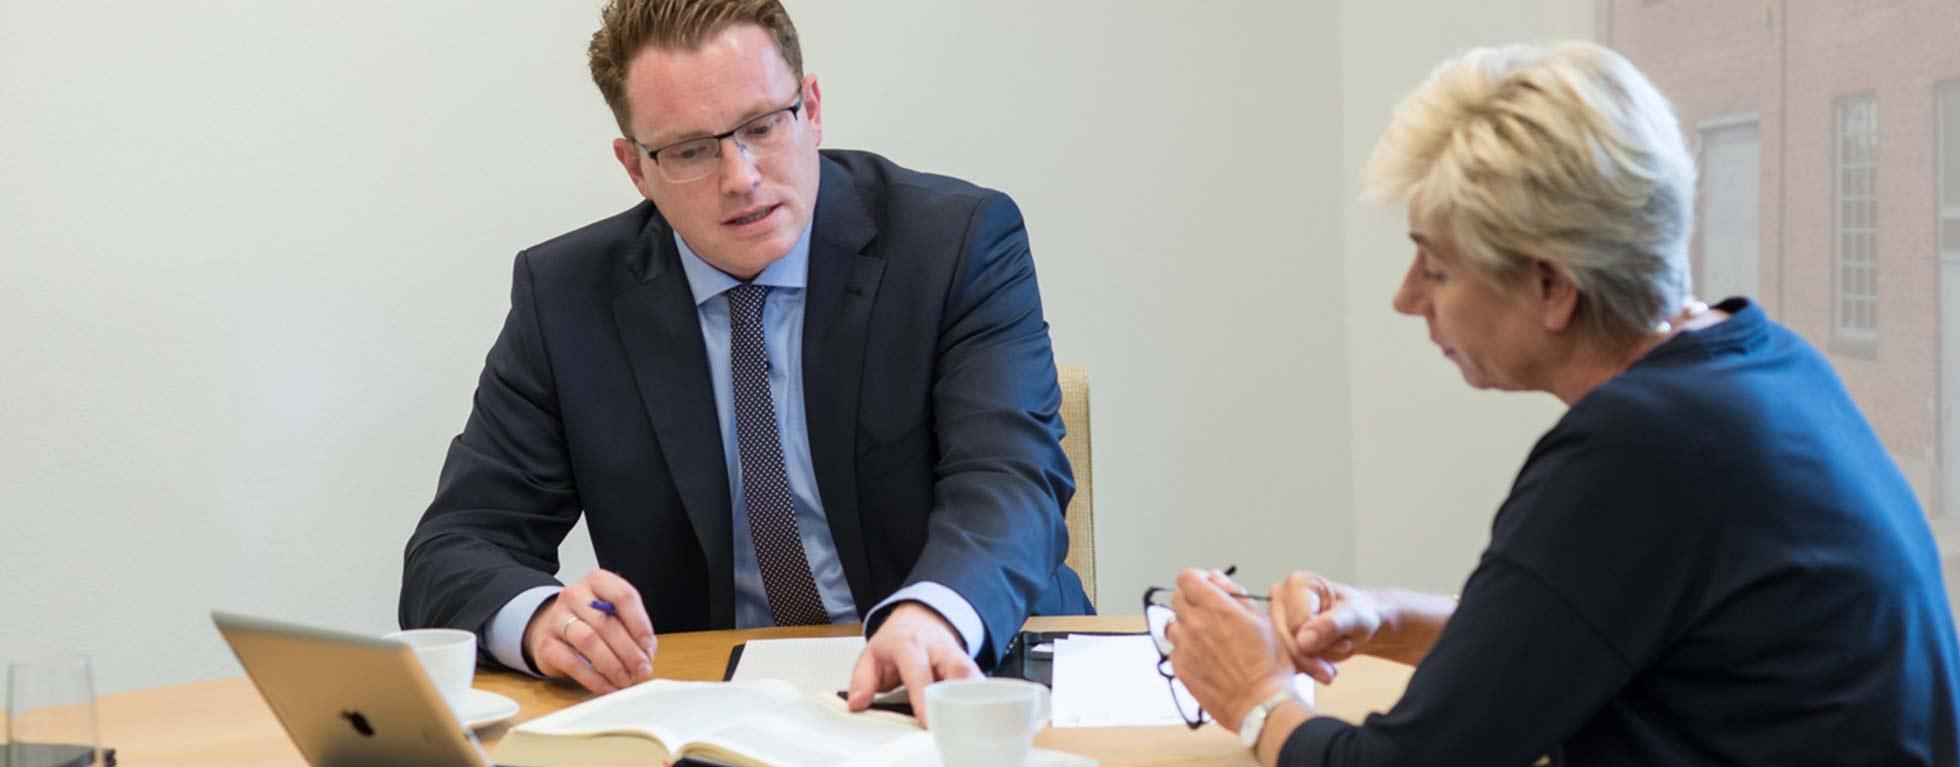 Hauschildt Mohrdiek Steuerberater Elmshorn Steuerberatung Schleswig-Holstein